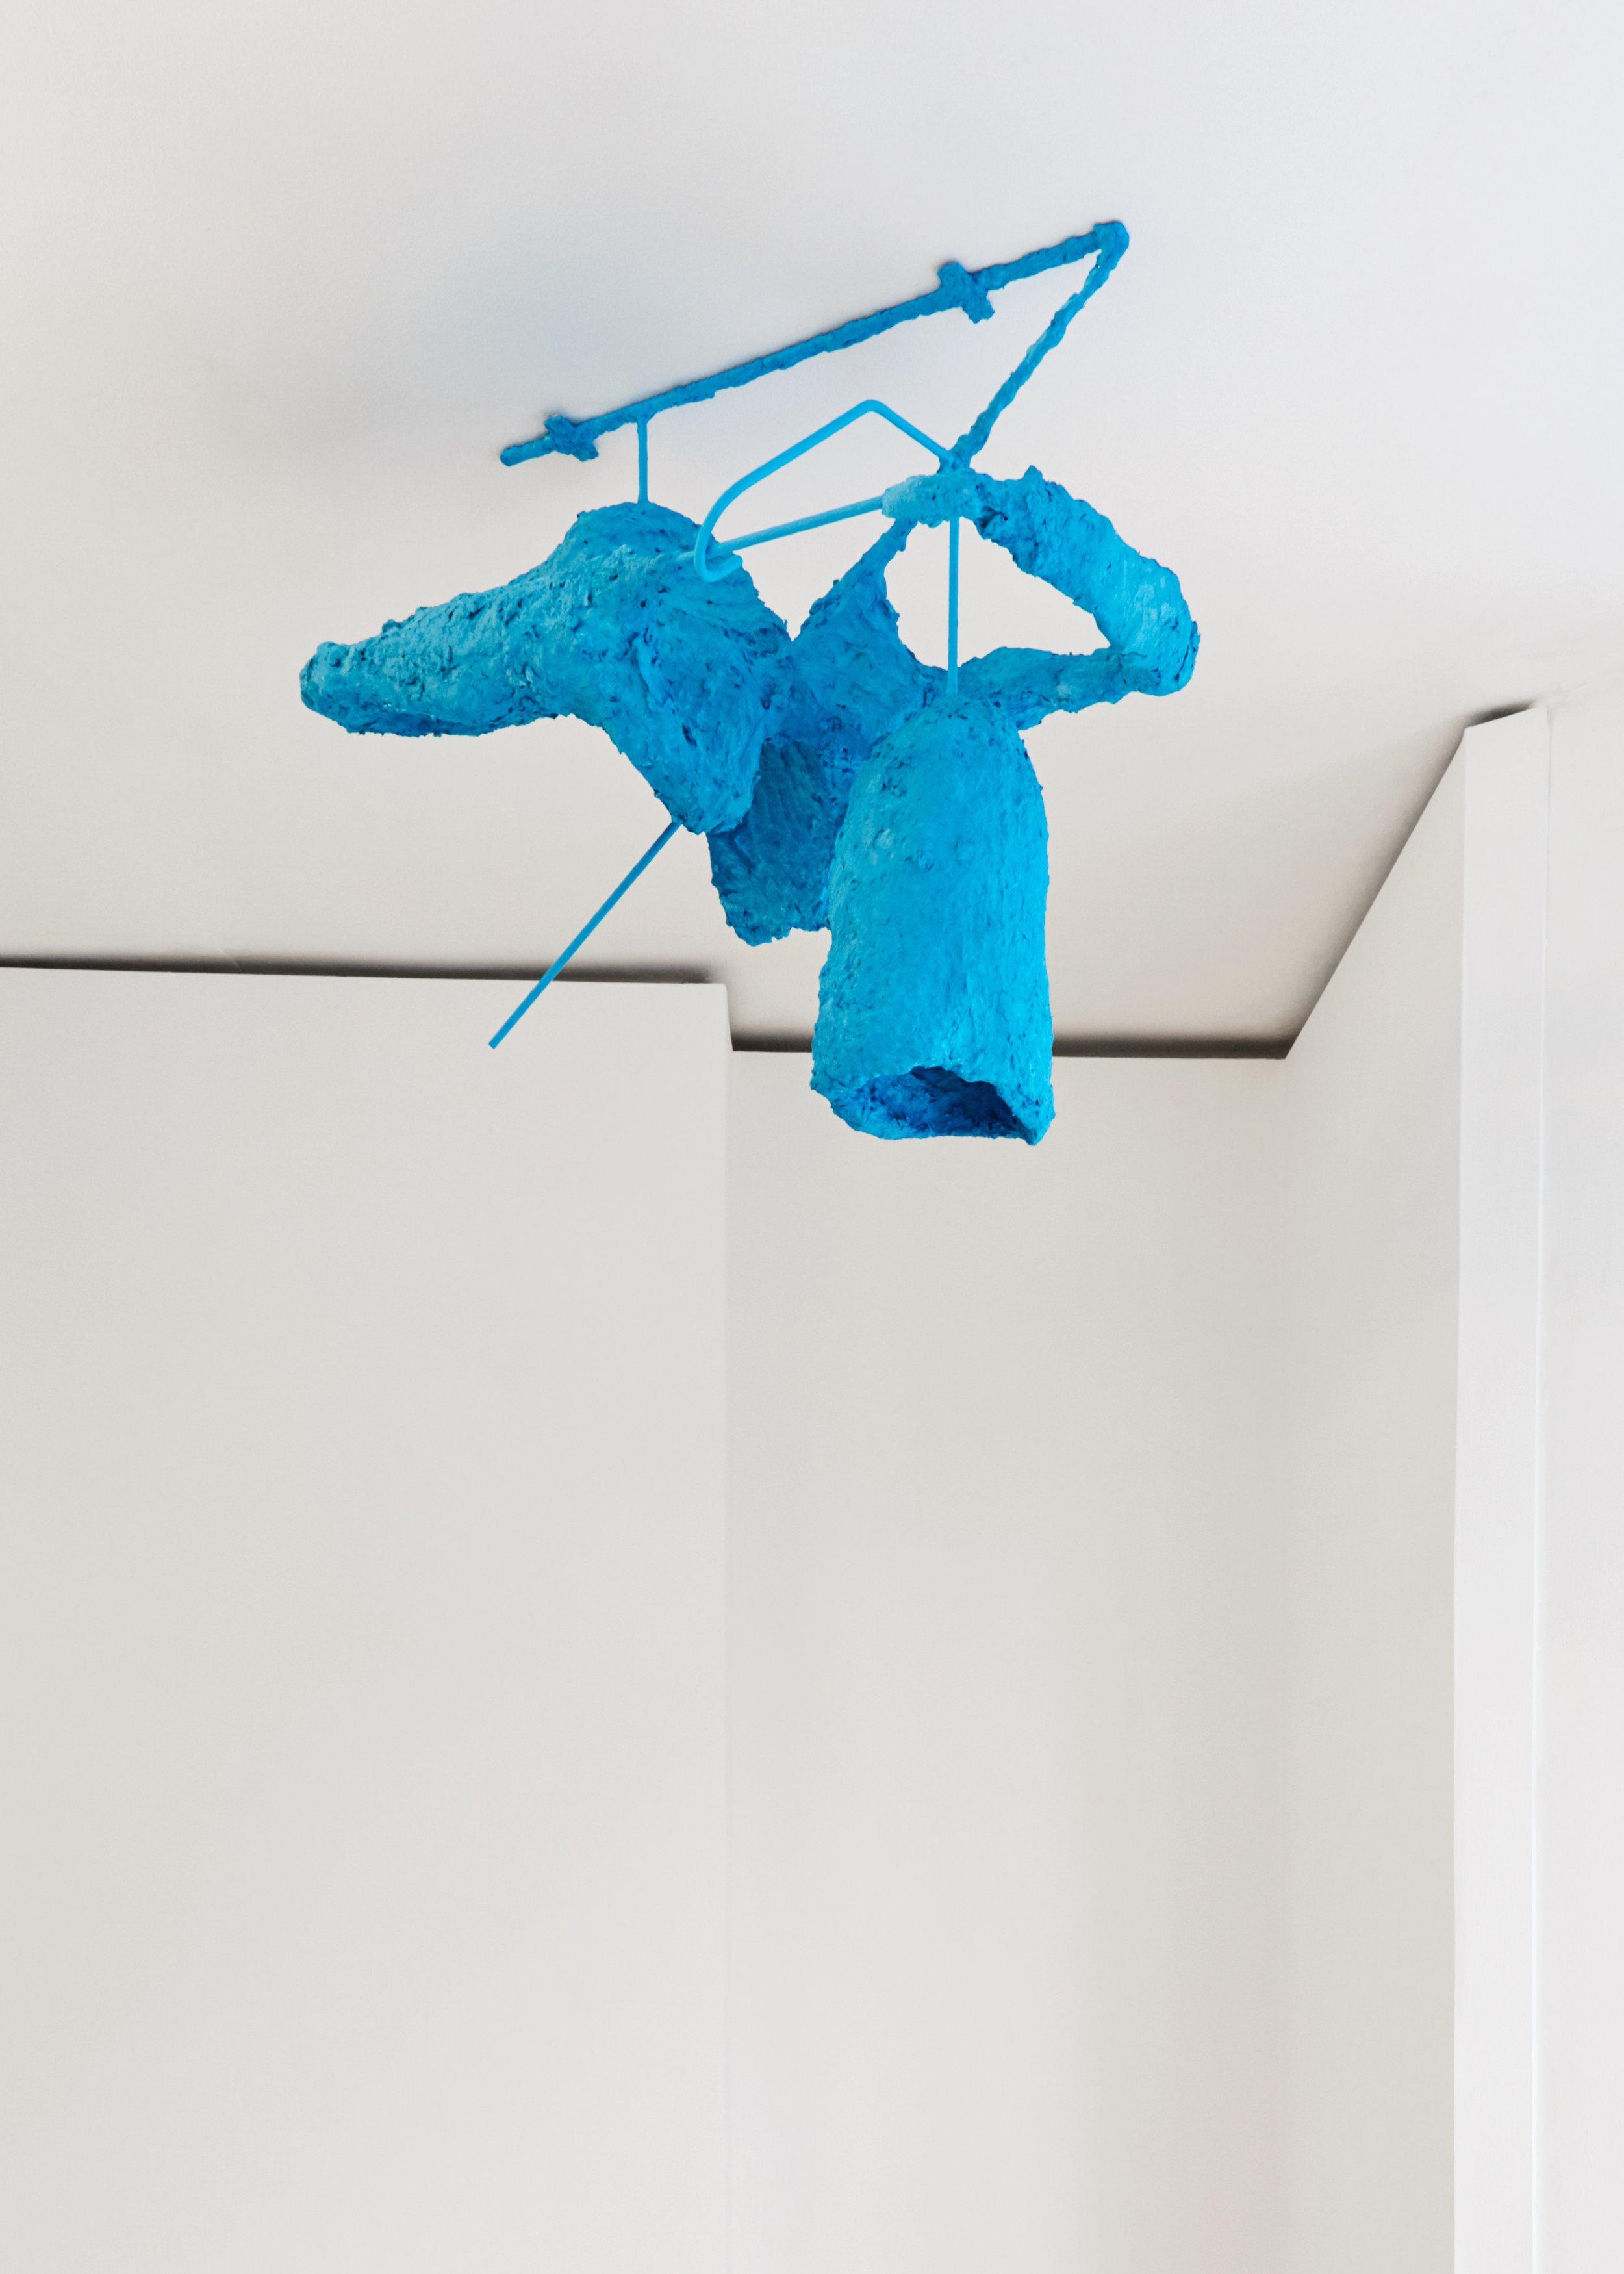 Eyrie, 2018  Steel, chicken wire, newspapers, paint, glue, plaster, screws 55 x 71 x 37 cm (ceiling piece)